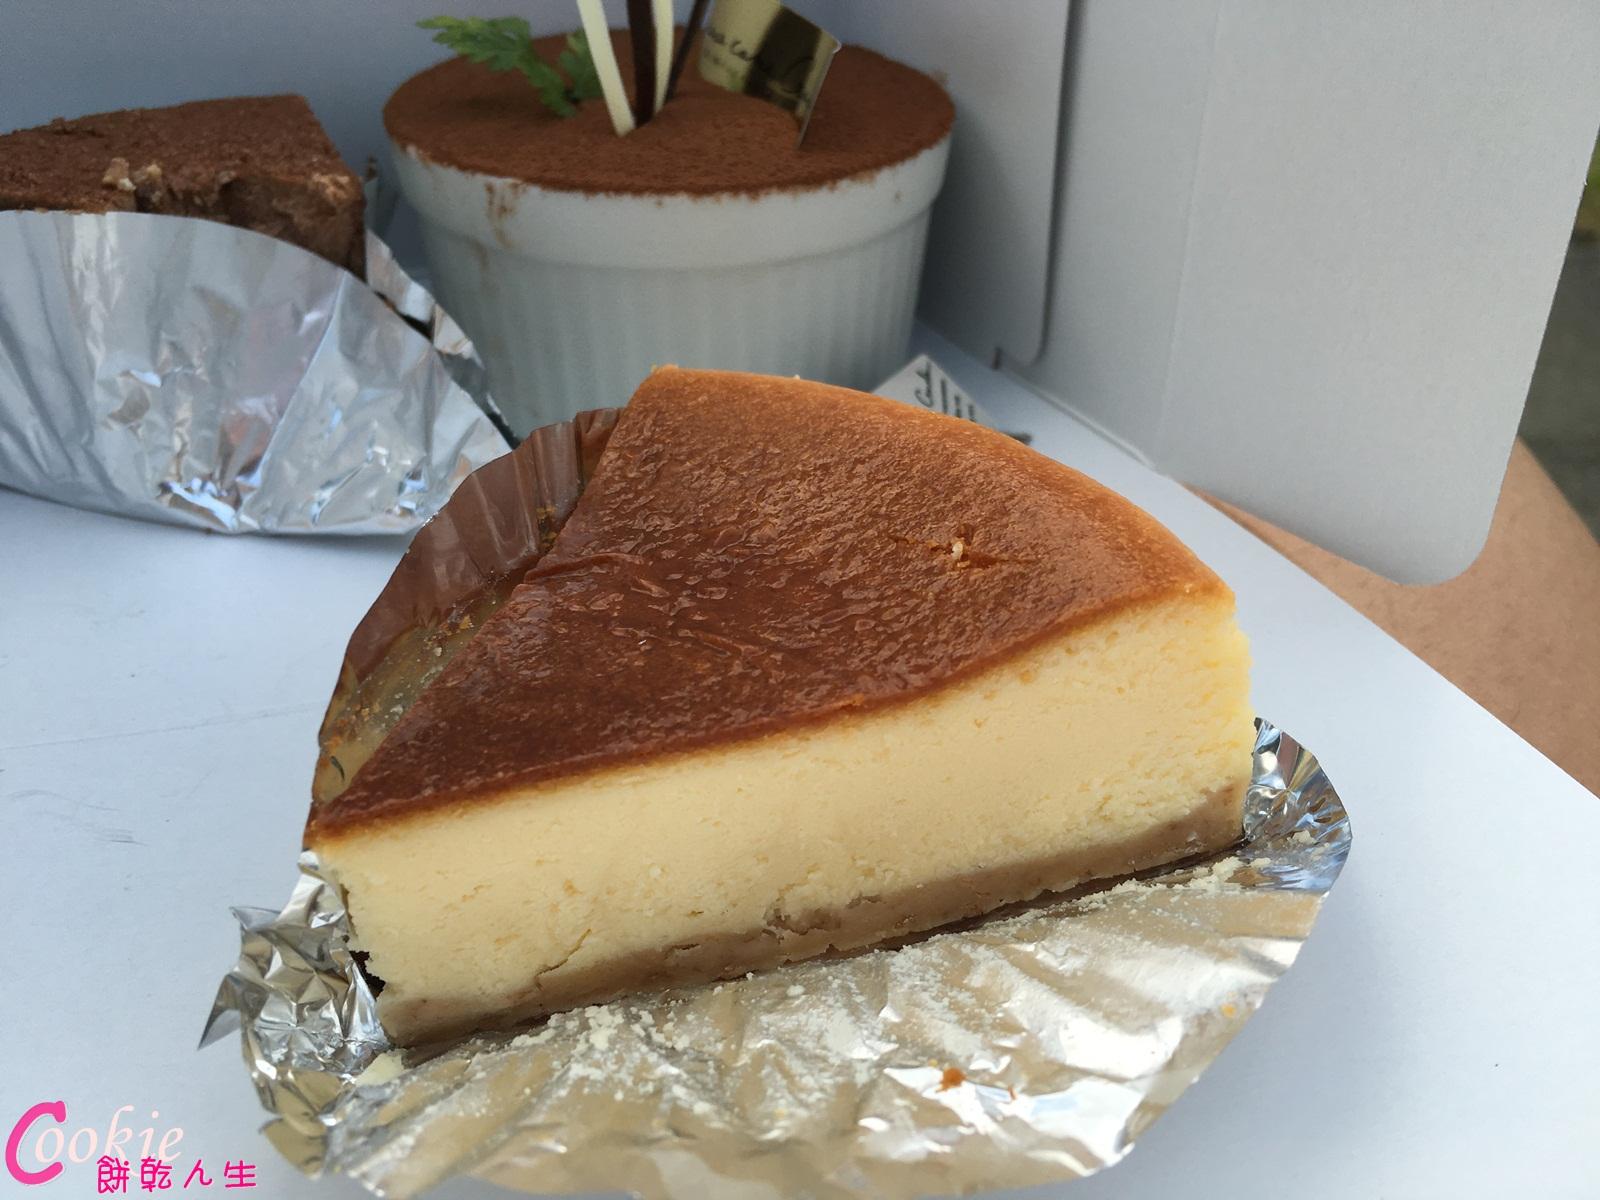 【Cheese Cake Garden】河口湖甜點蛋糕店 起司蛋糕必吃 @ 餅乾人生Cookie Life :: 痞客邦